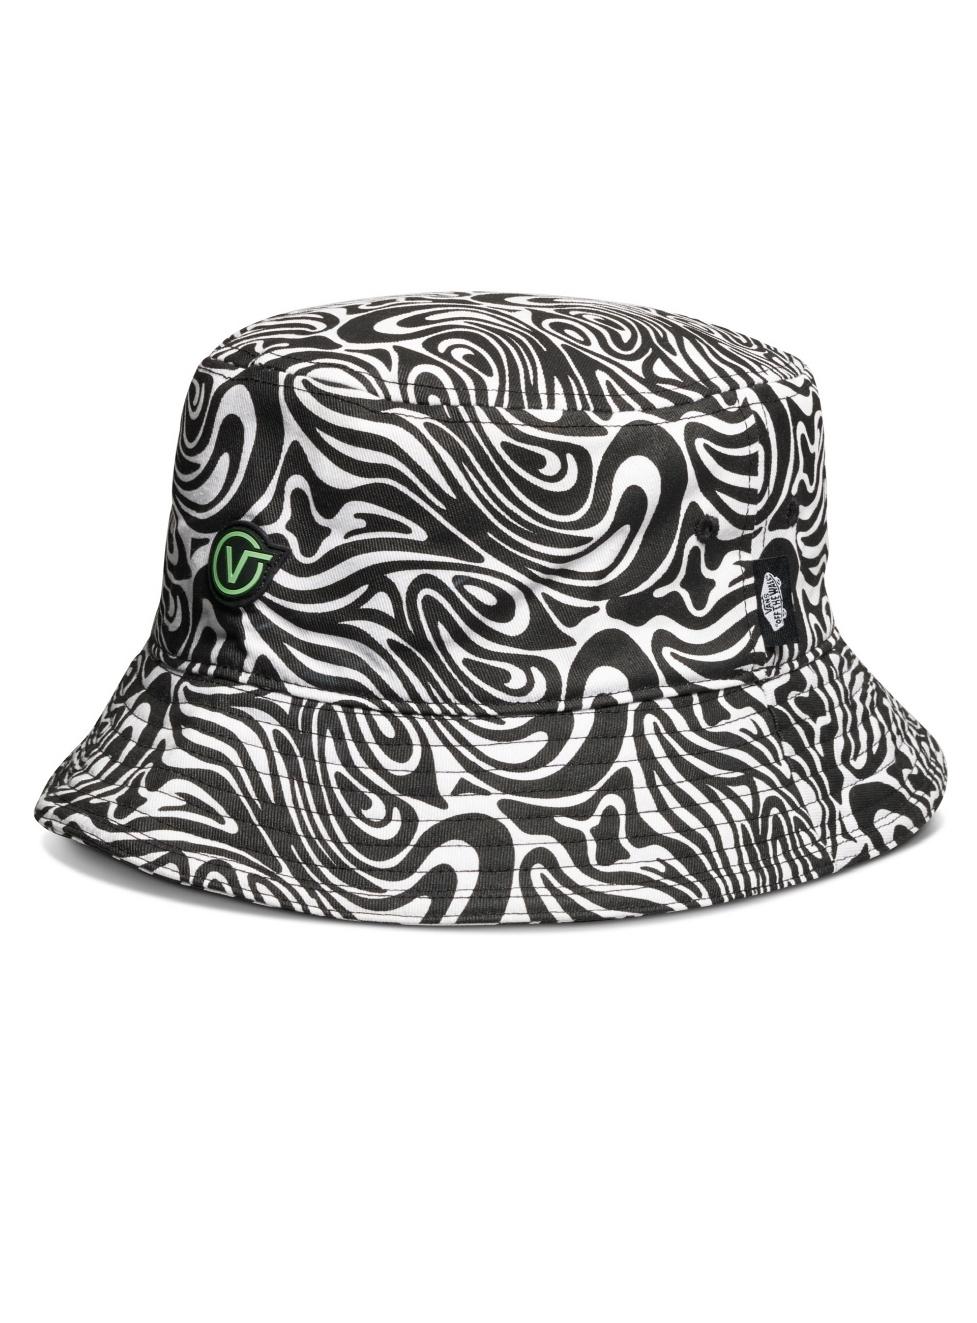 Anderson. paak 'Malibu' X Vans Hat (VN0A54A22111)